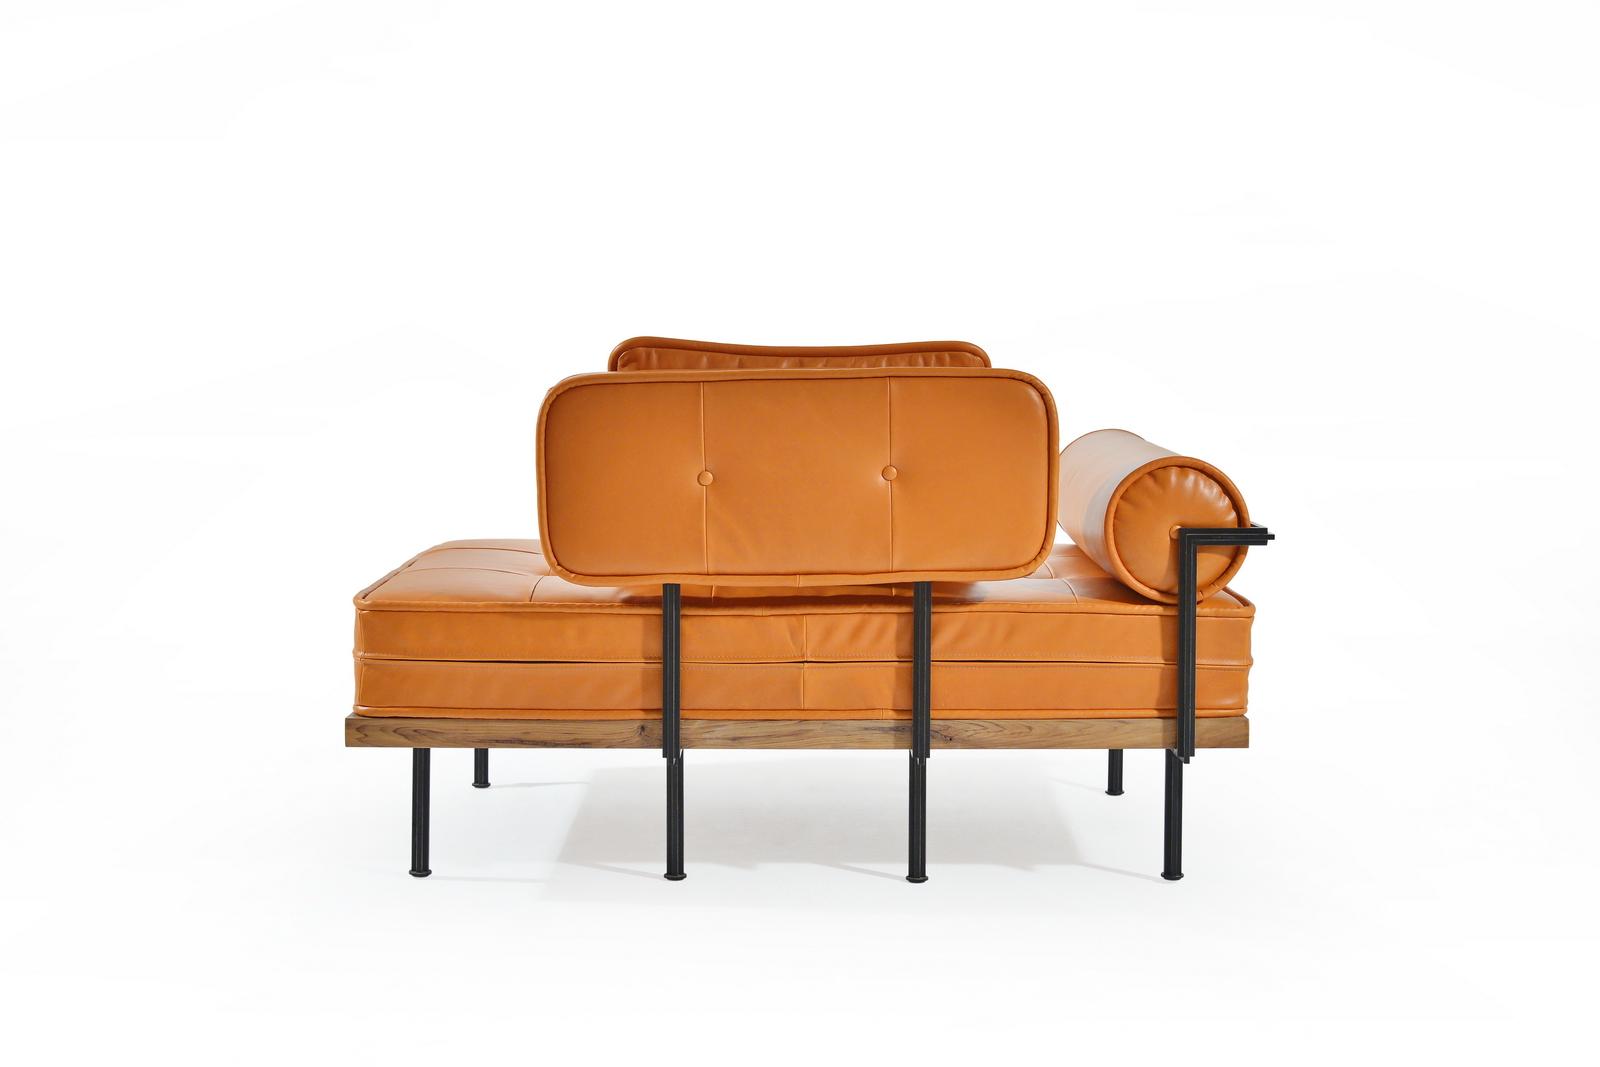 PTendercool-Sofa Corner-BS3-TE-BL-NO-Leather-210623-27